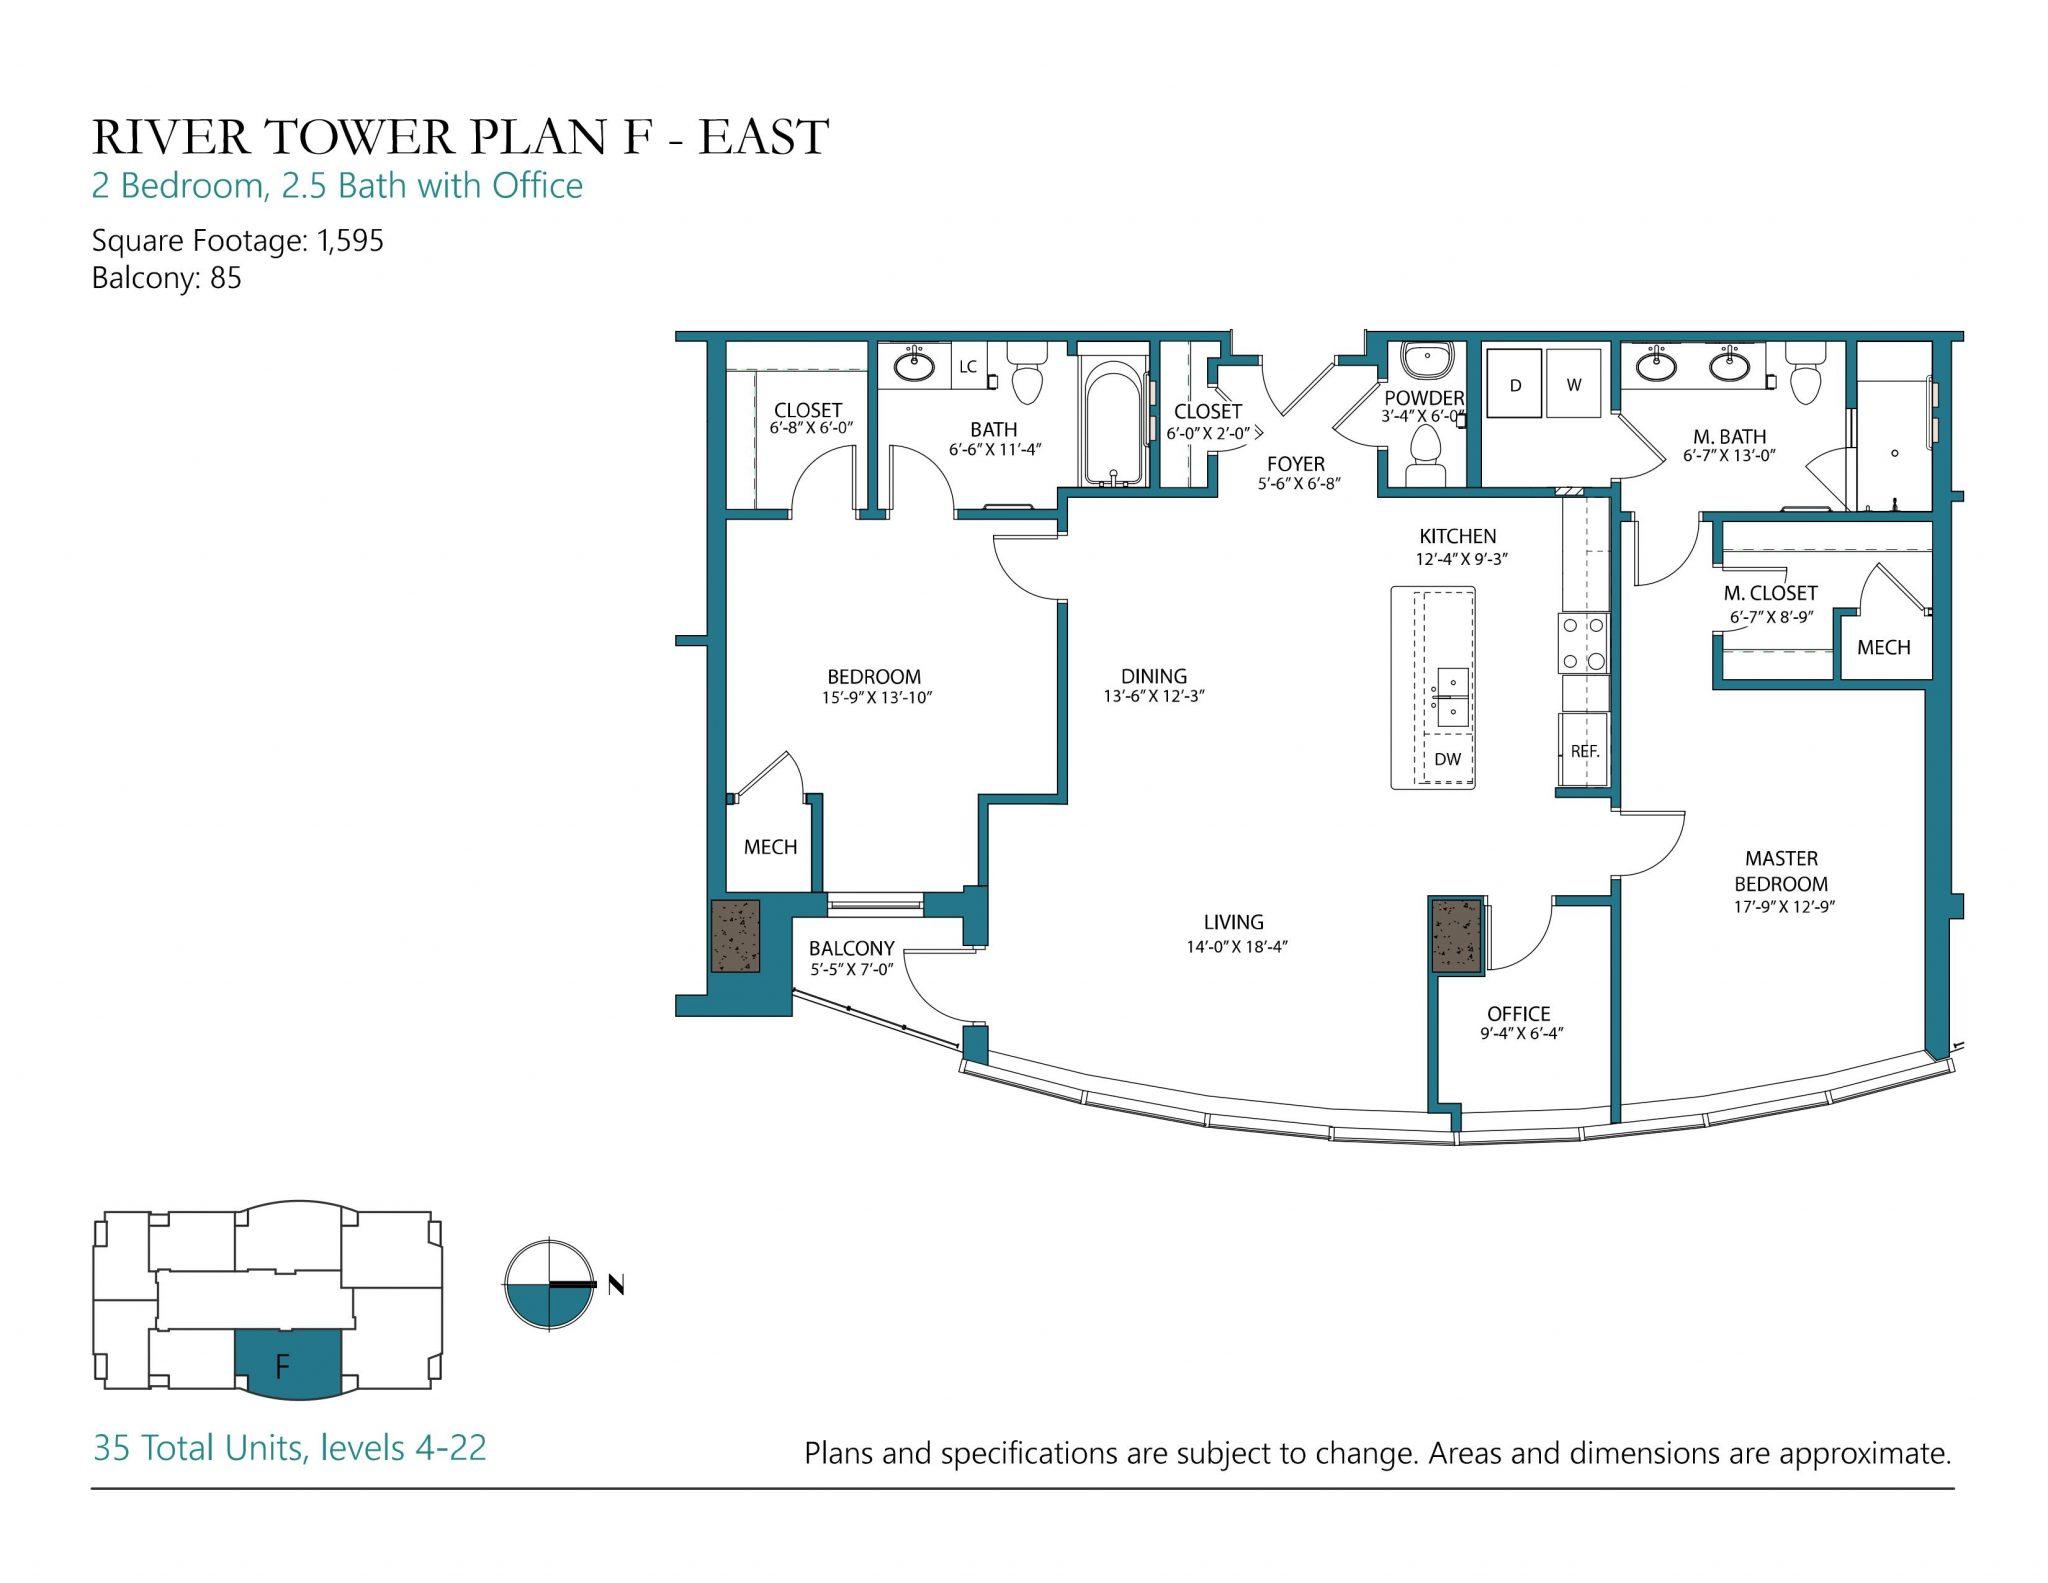 Plan F East